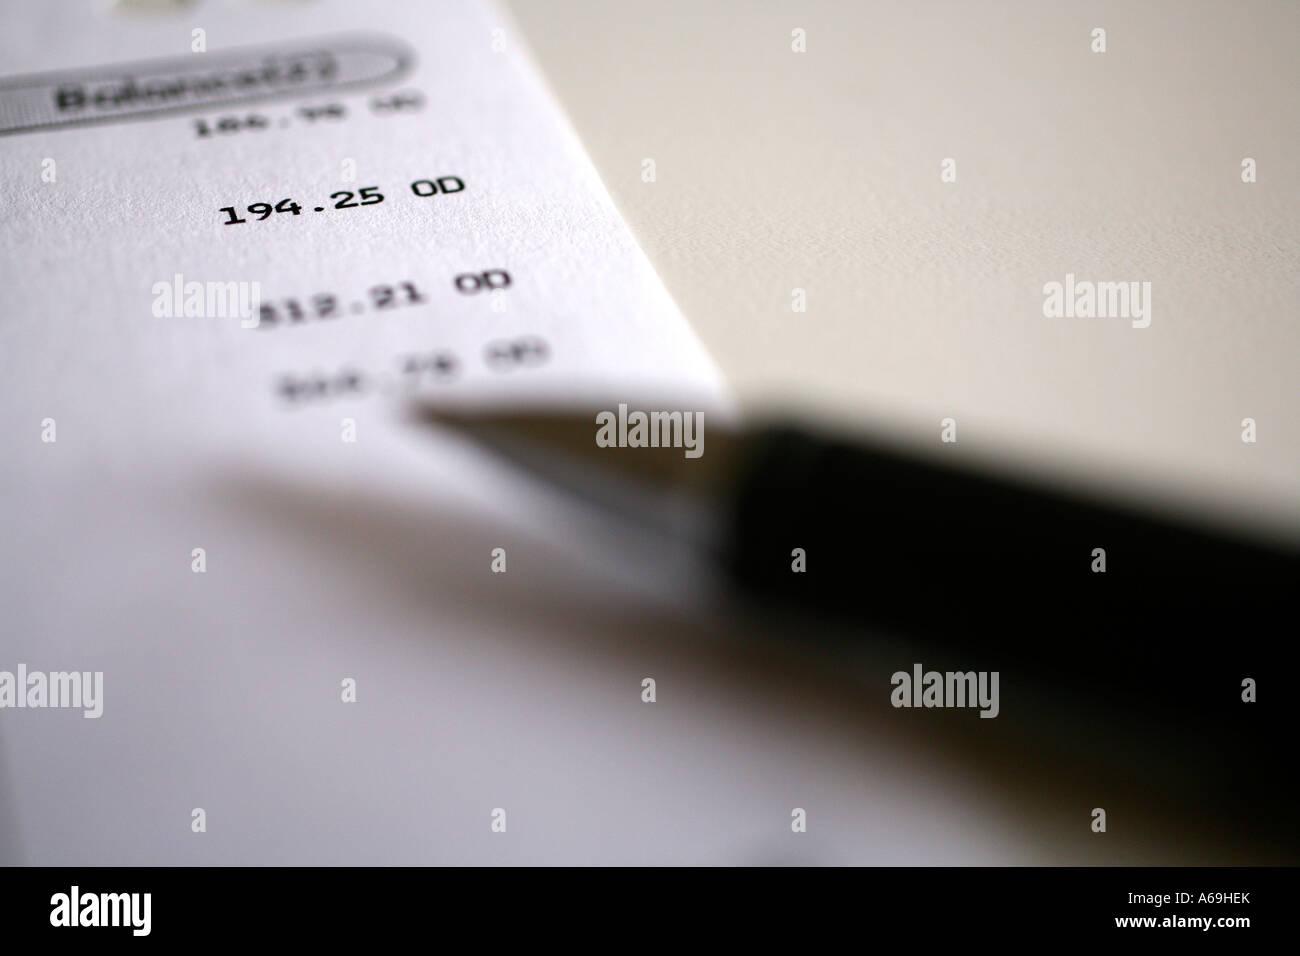 Close up of overdrawn UK bank statement - Stock Image